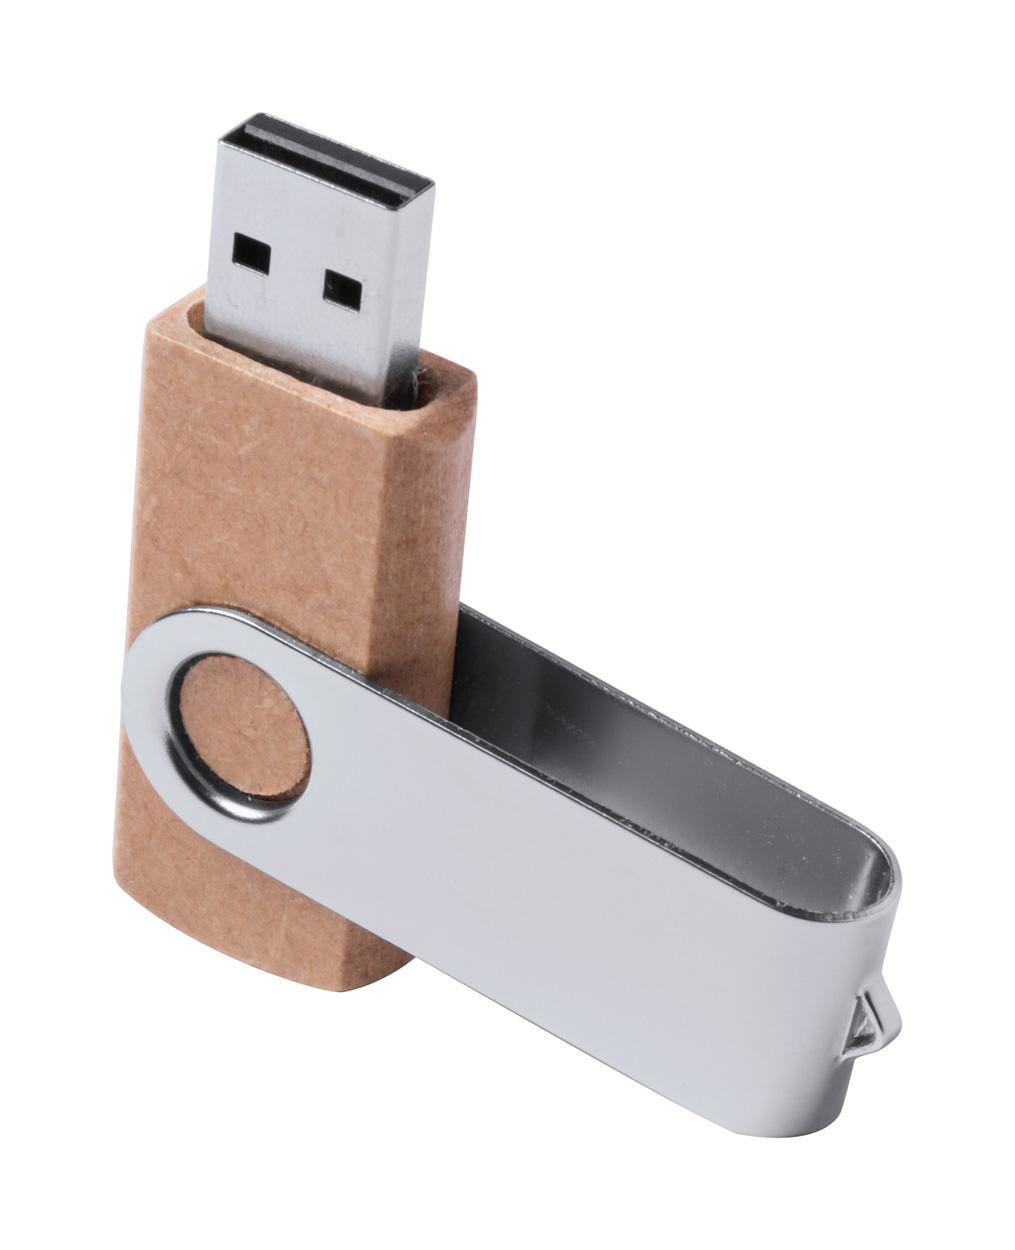 16GB Trugel 16GB USB memória|Trugel 16GB USB memória|Trugel 16GB USB memória|Trugel 16GB USB memória|Trugel 16GB USB memória